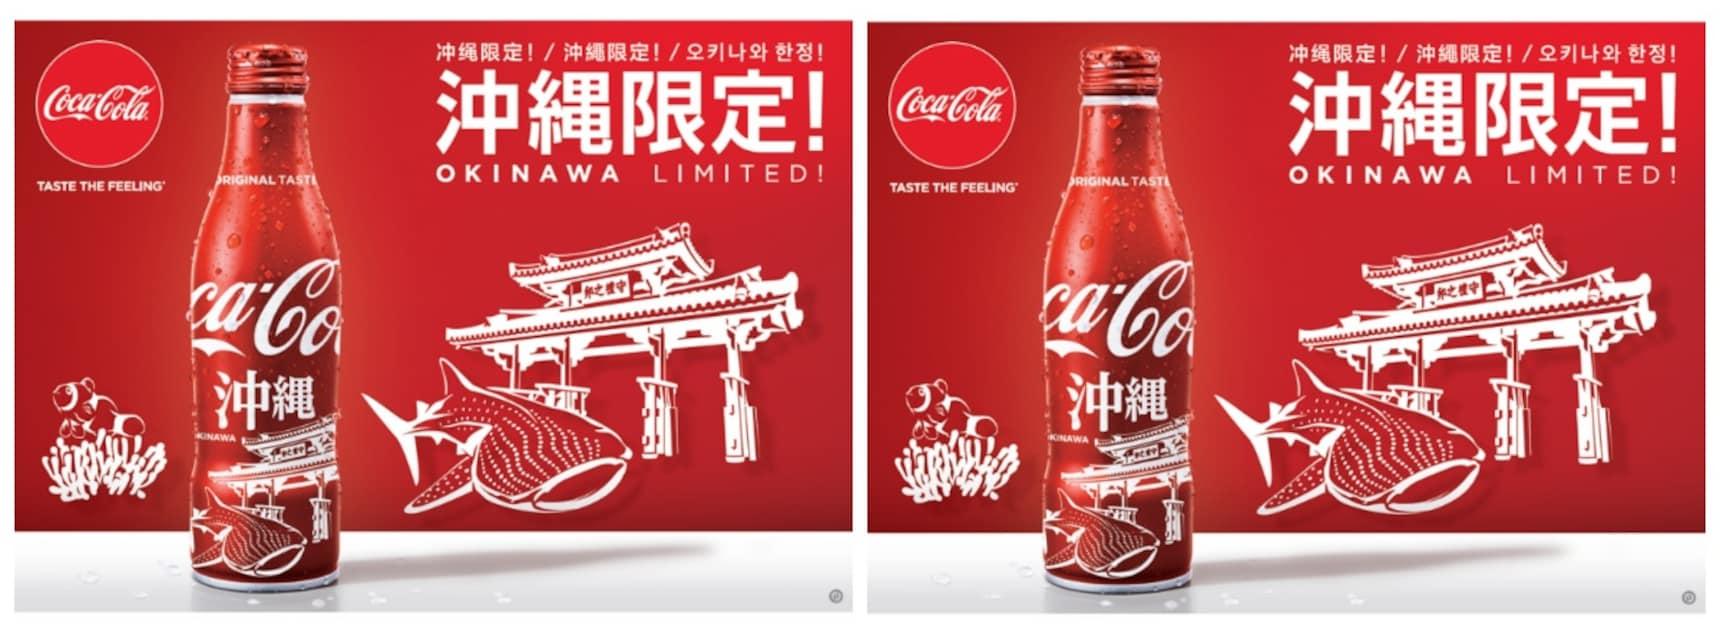 Rep Your Ryukyu Pride with Okinawa Coca-Cola